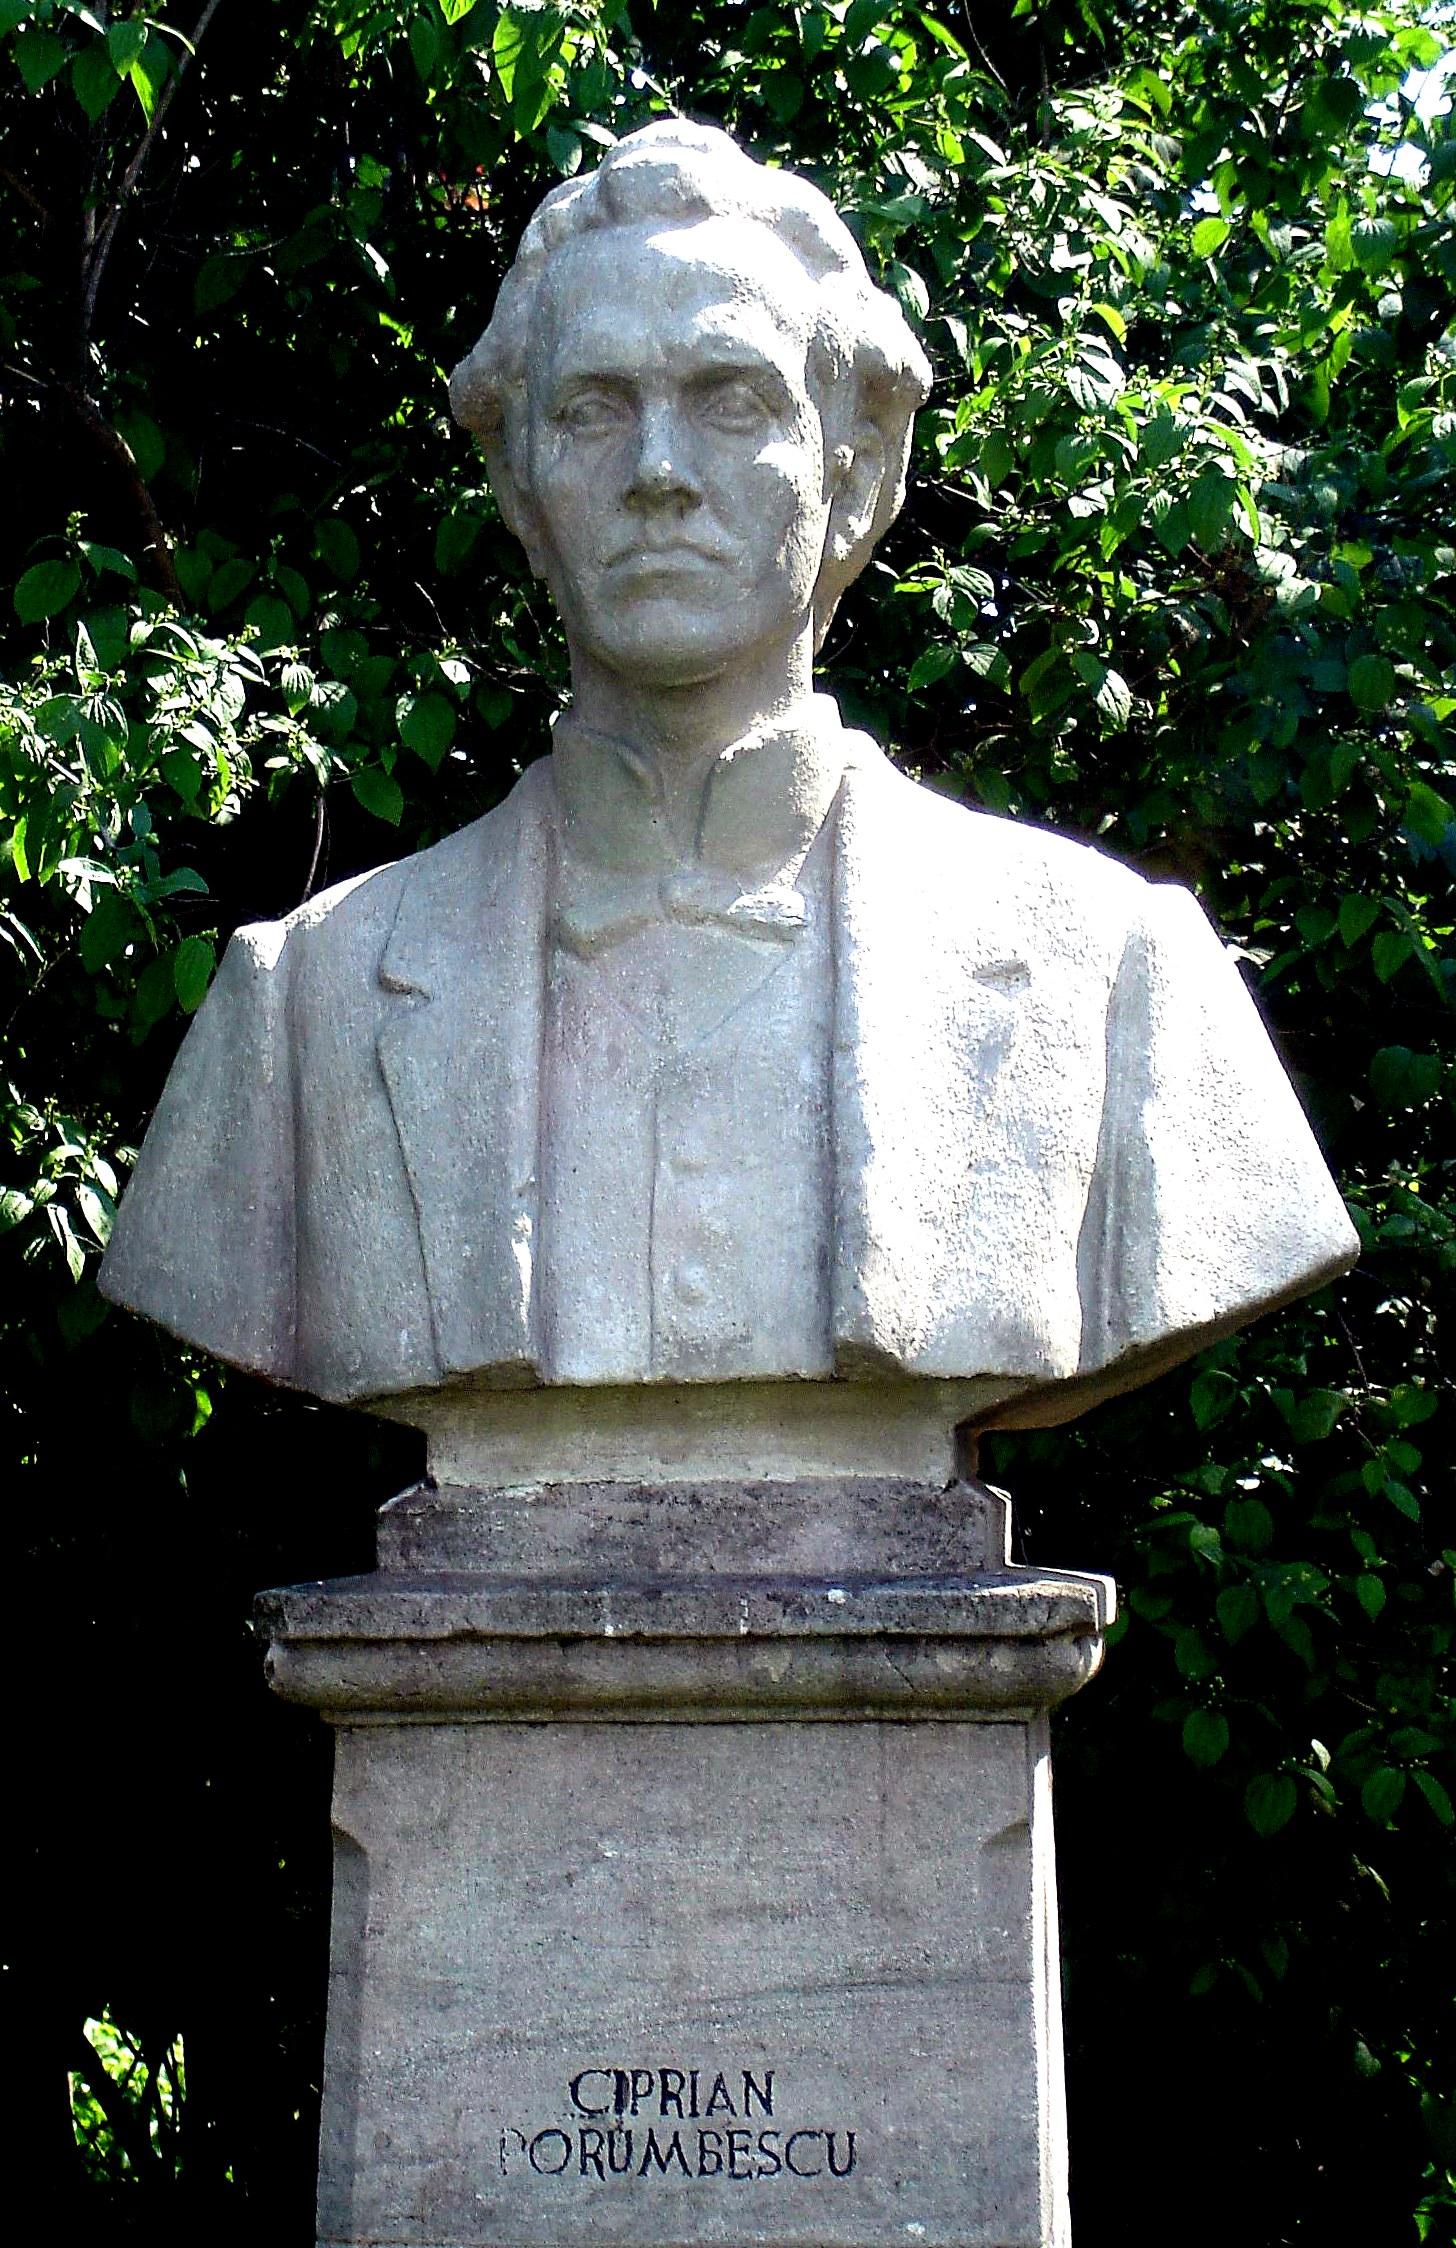 busto di Ciprian Porumbescu